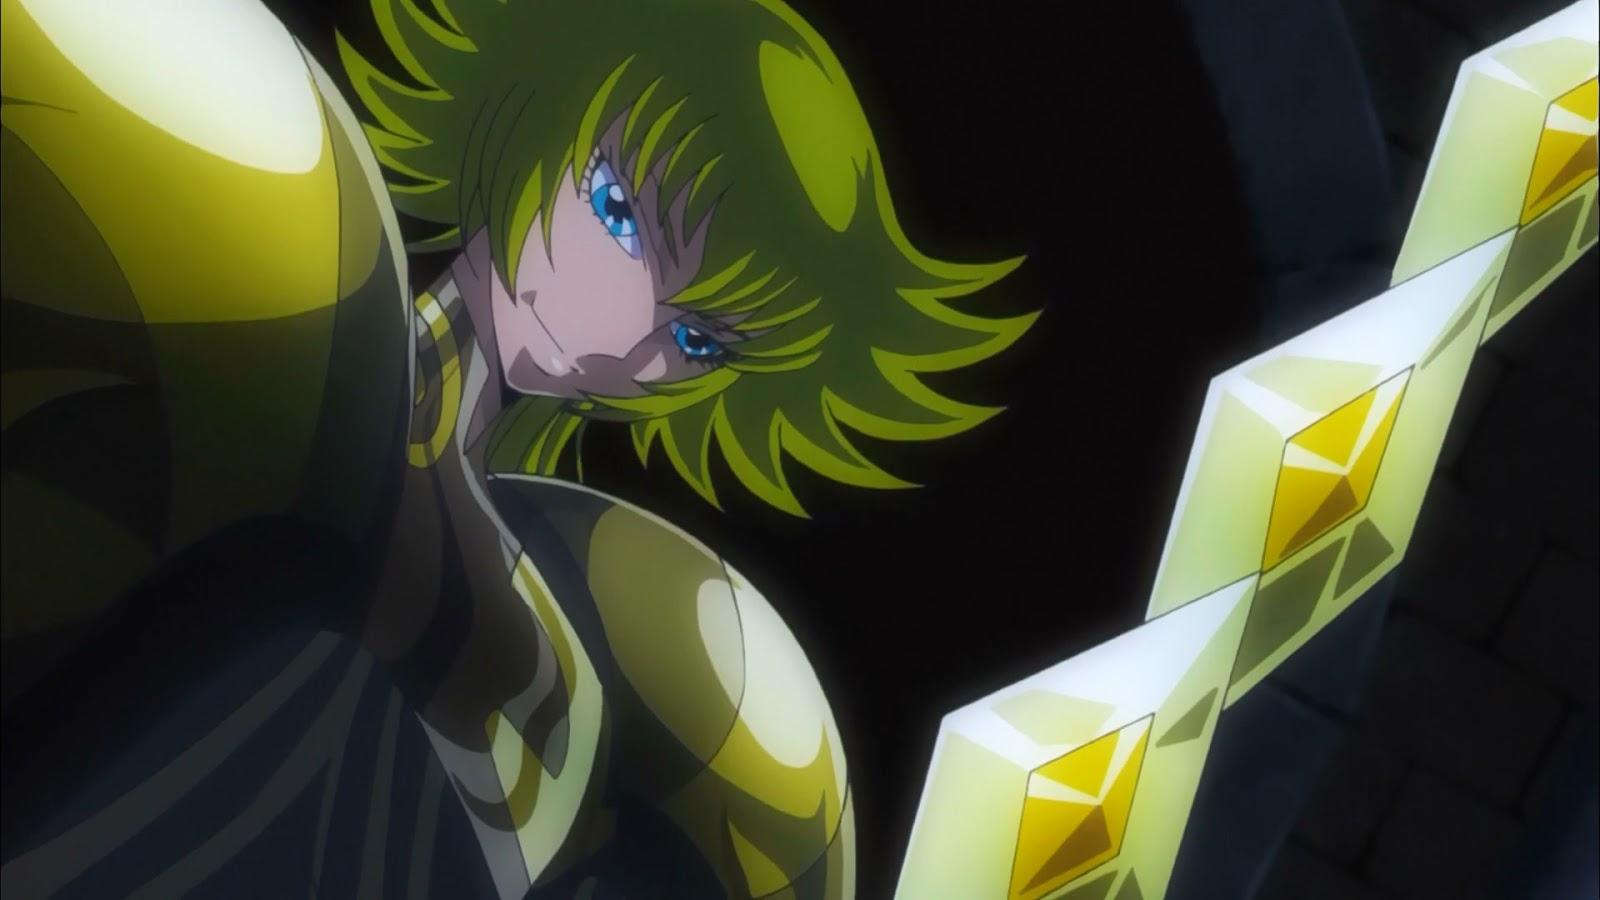 Saint Seiya Omega Temporada 2 Capitulo 07